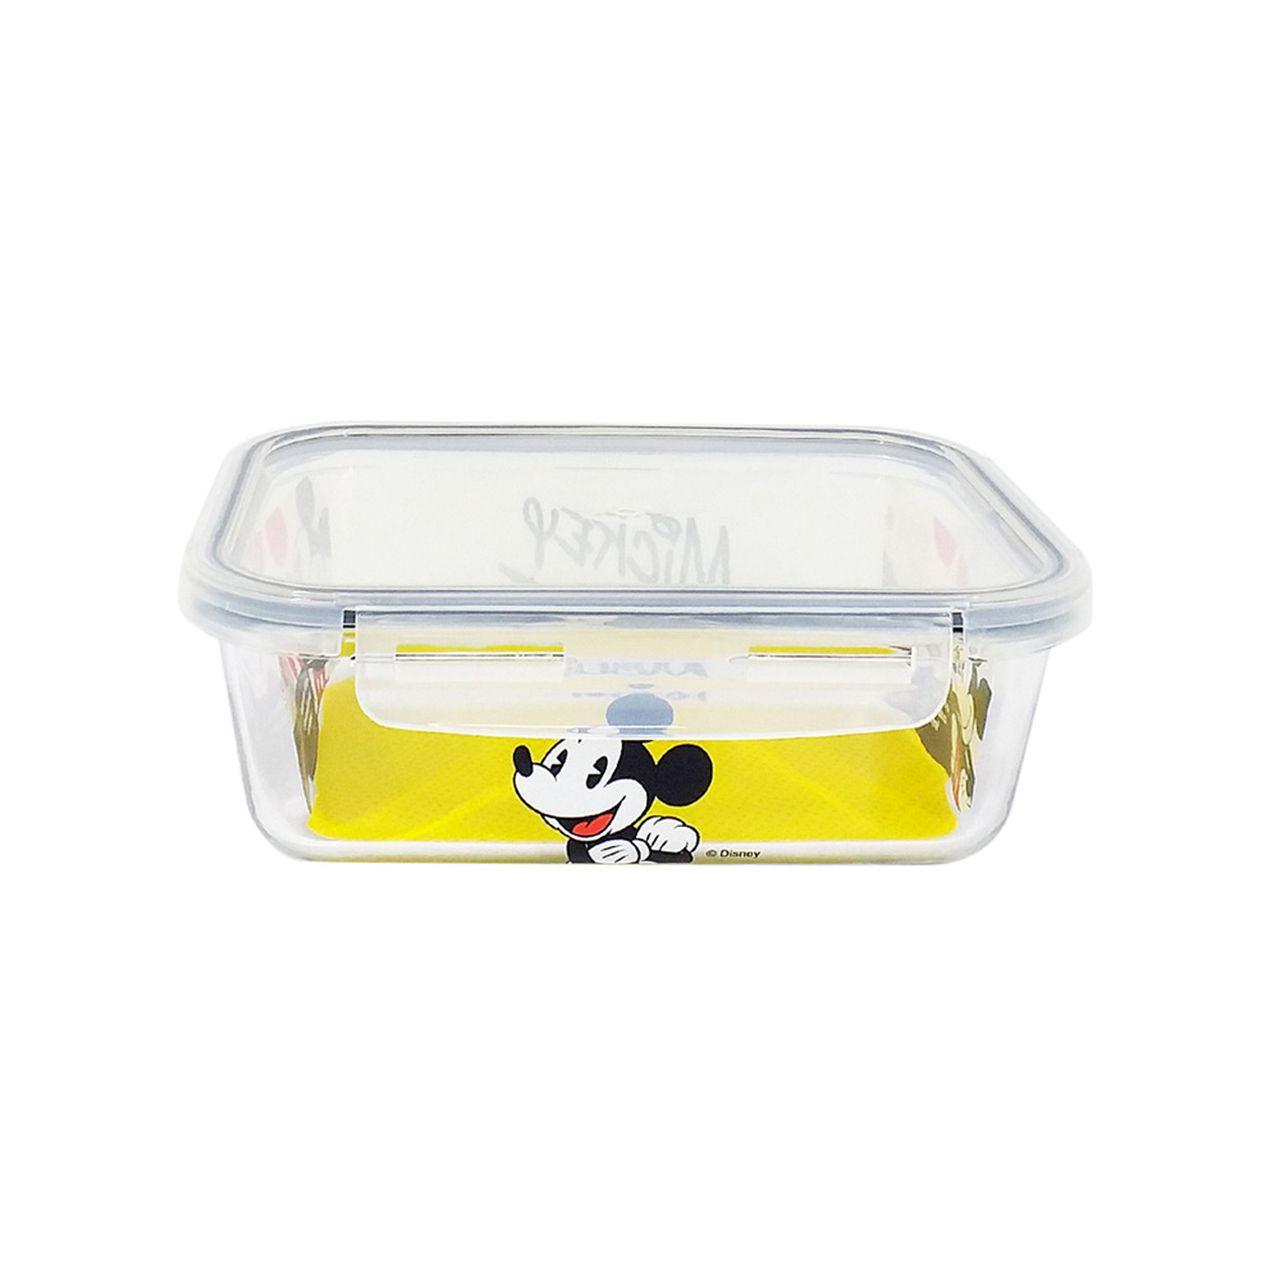 Pote de Vidro Com Tampa e Trava (800ml): Mickey Mouse - Disney